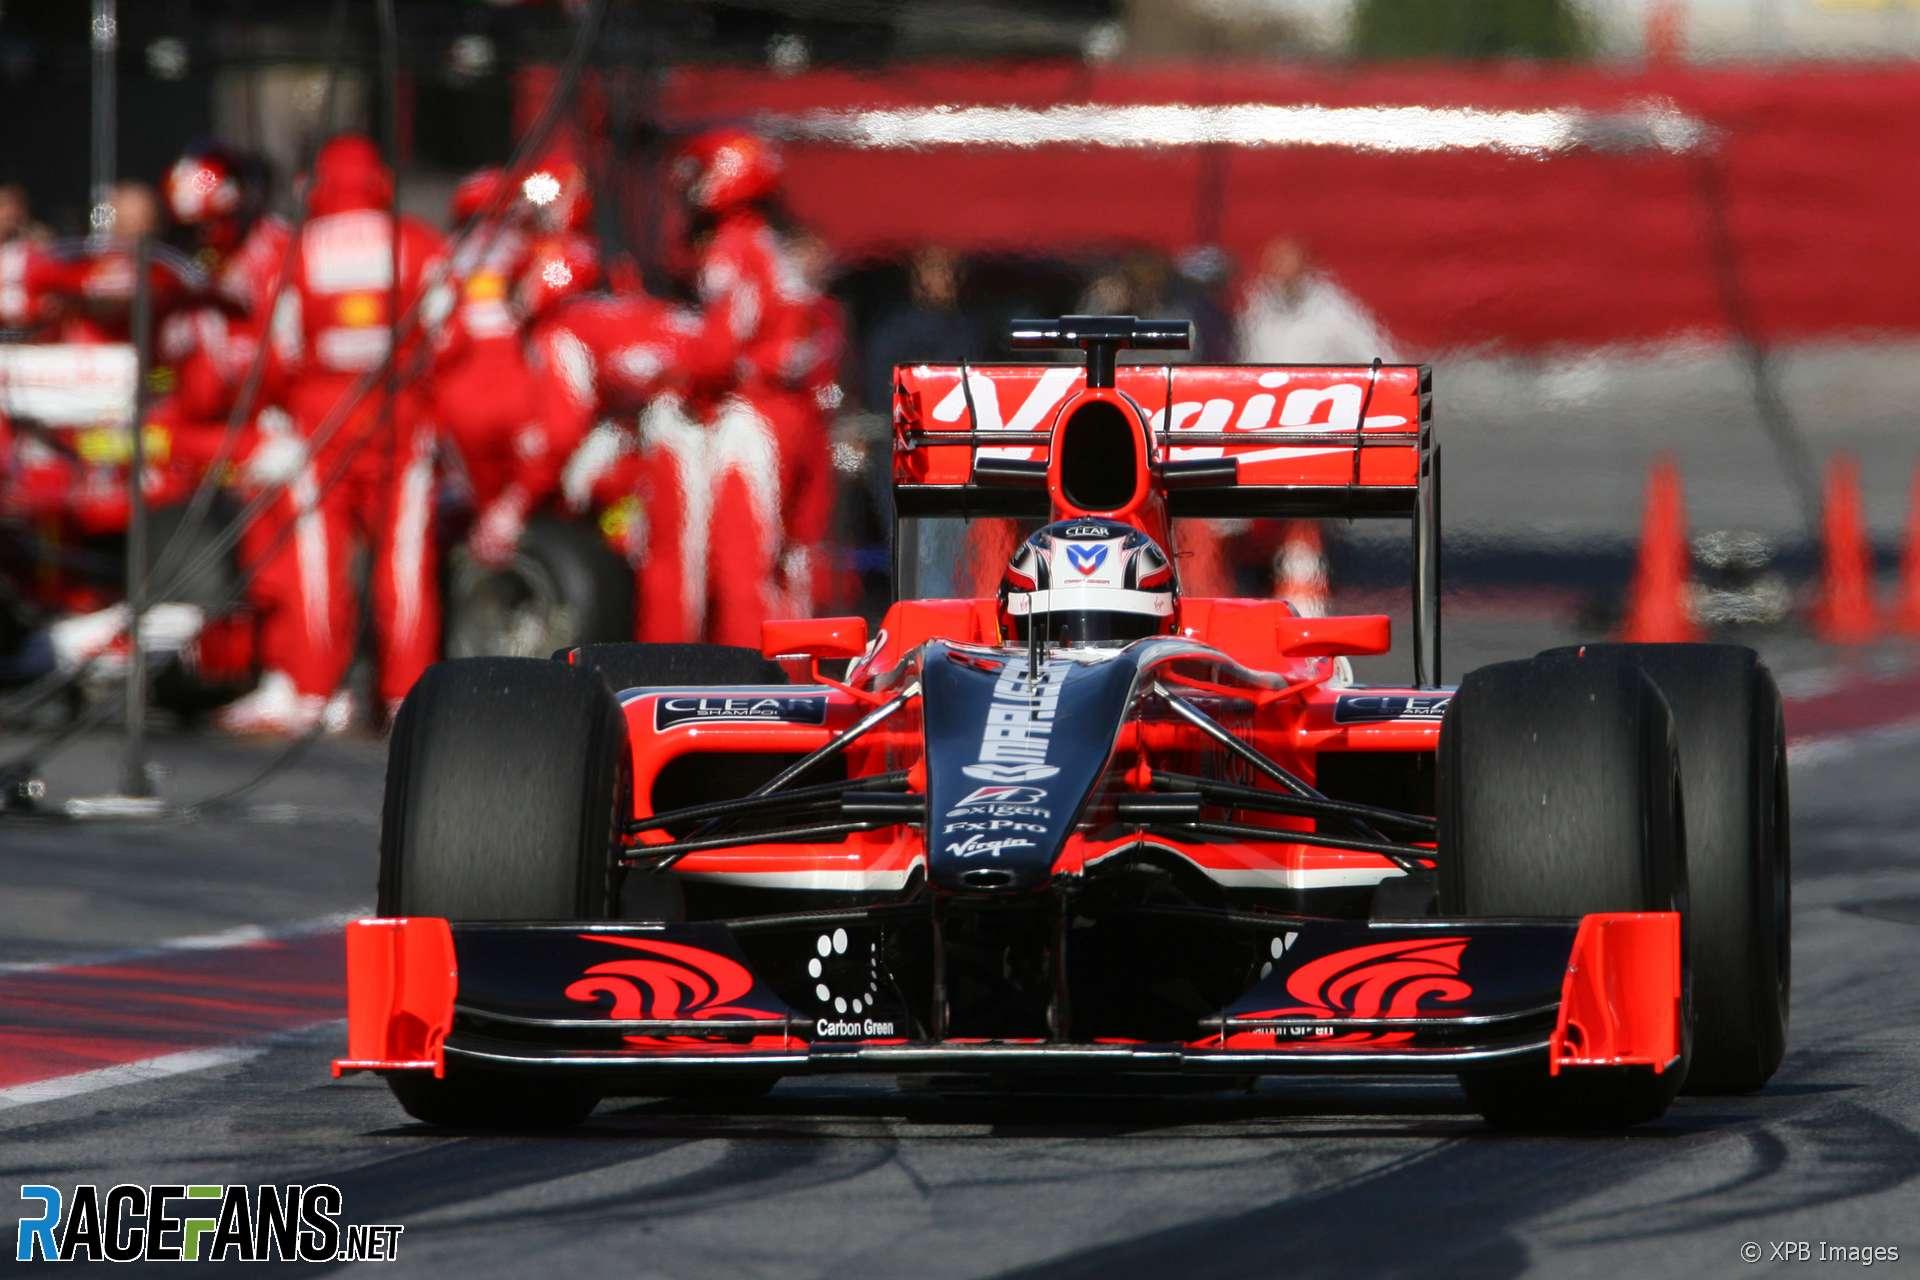 Timo Glock, Virgin, Circuit de Catalunya, 2010